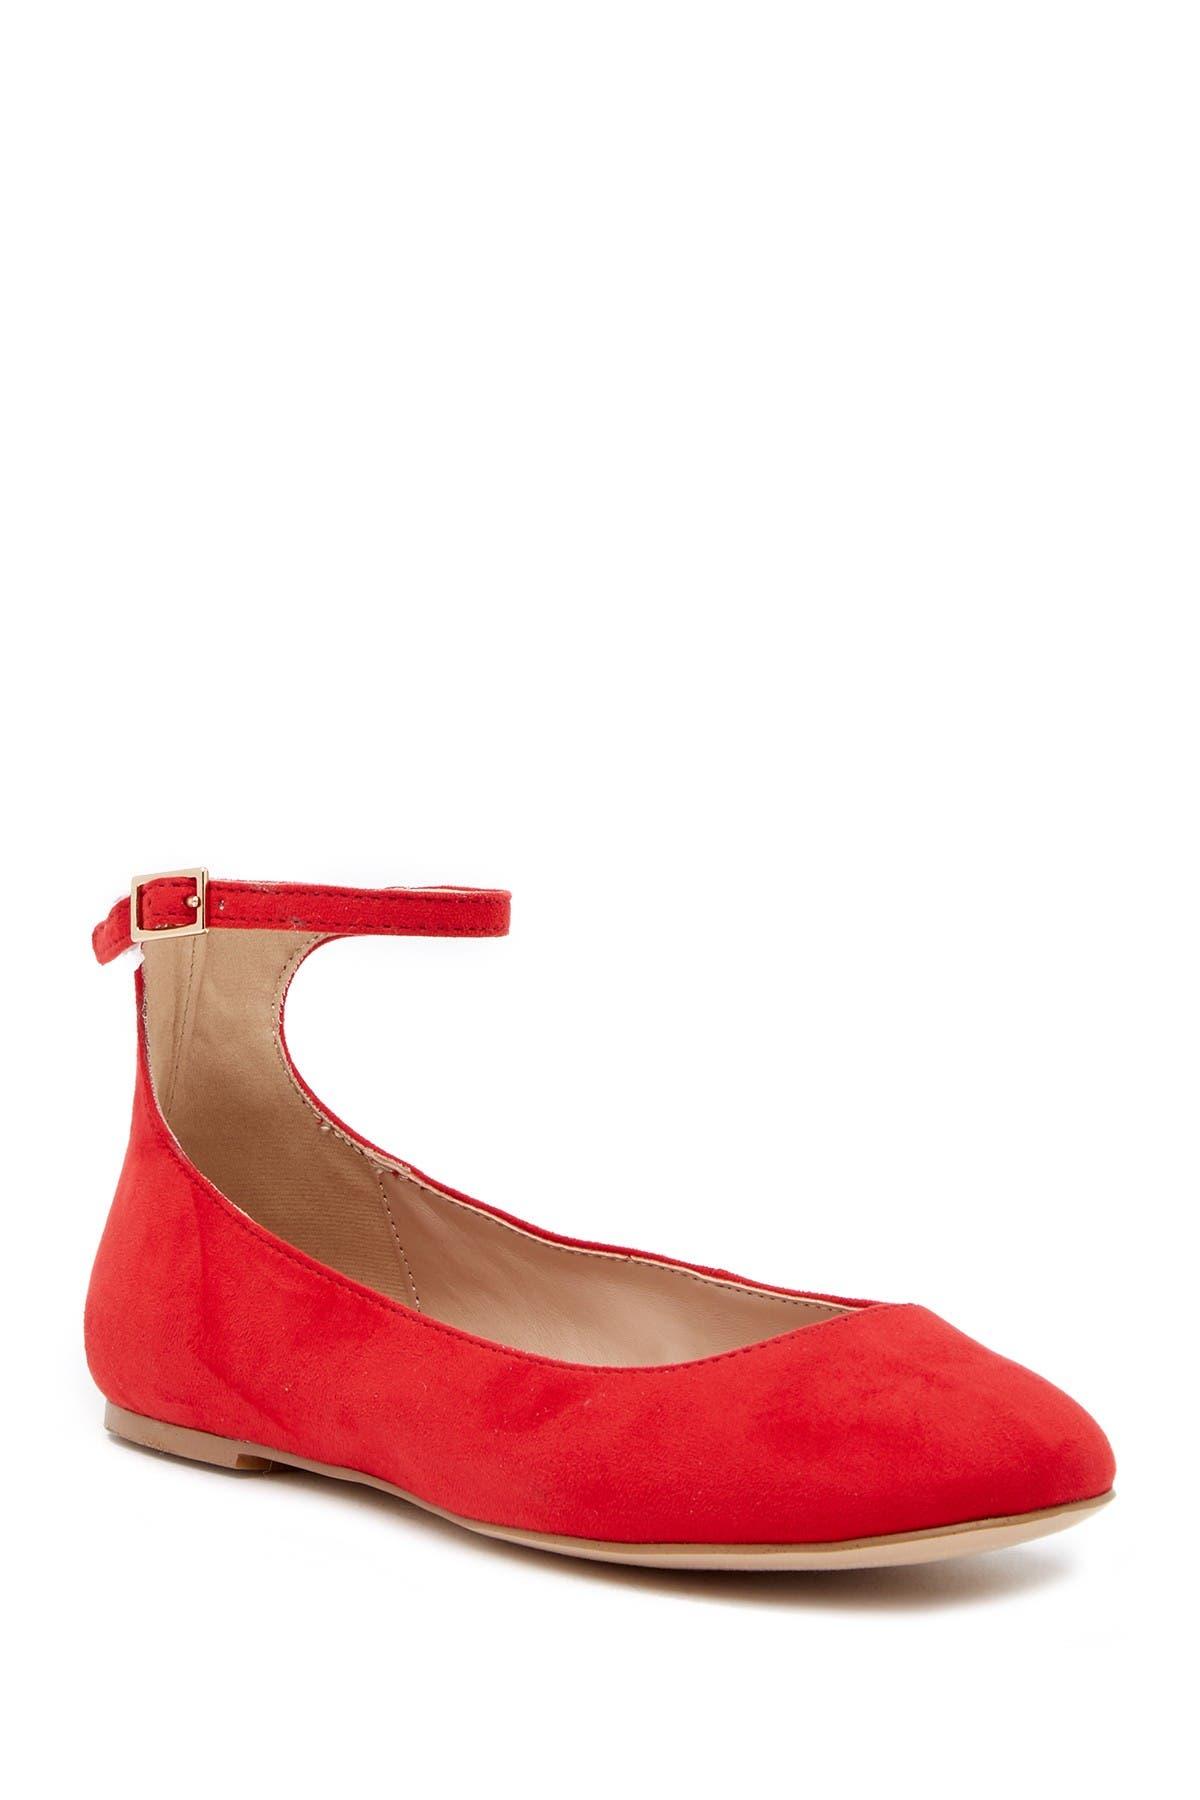 Image of BCBG Gwen Ankle Strap Flat